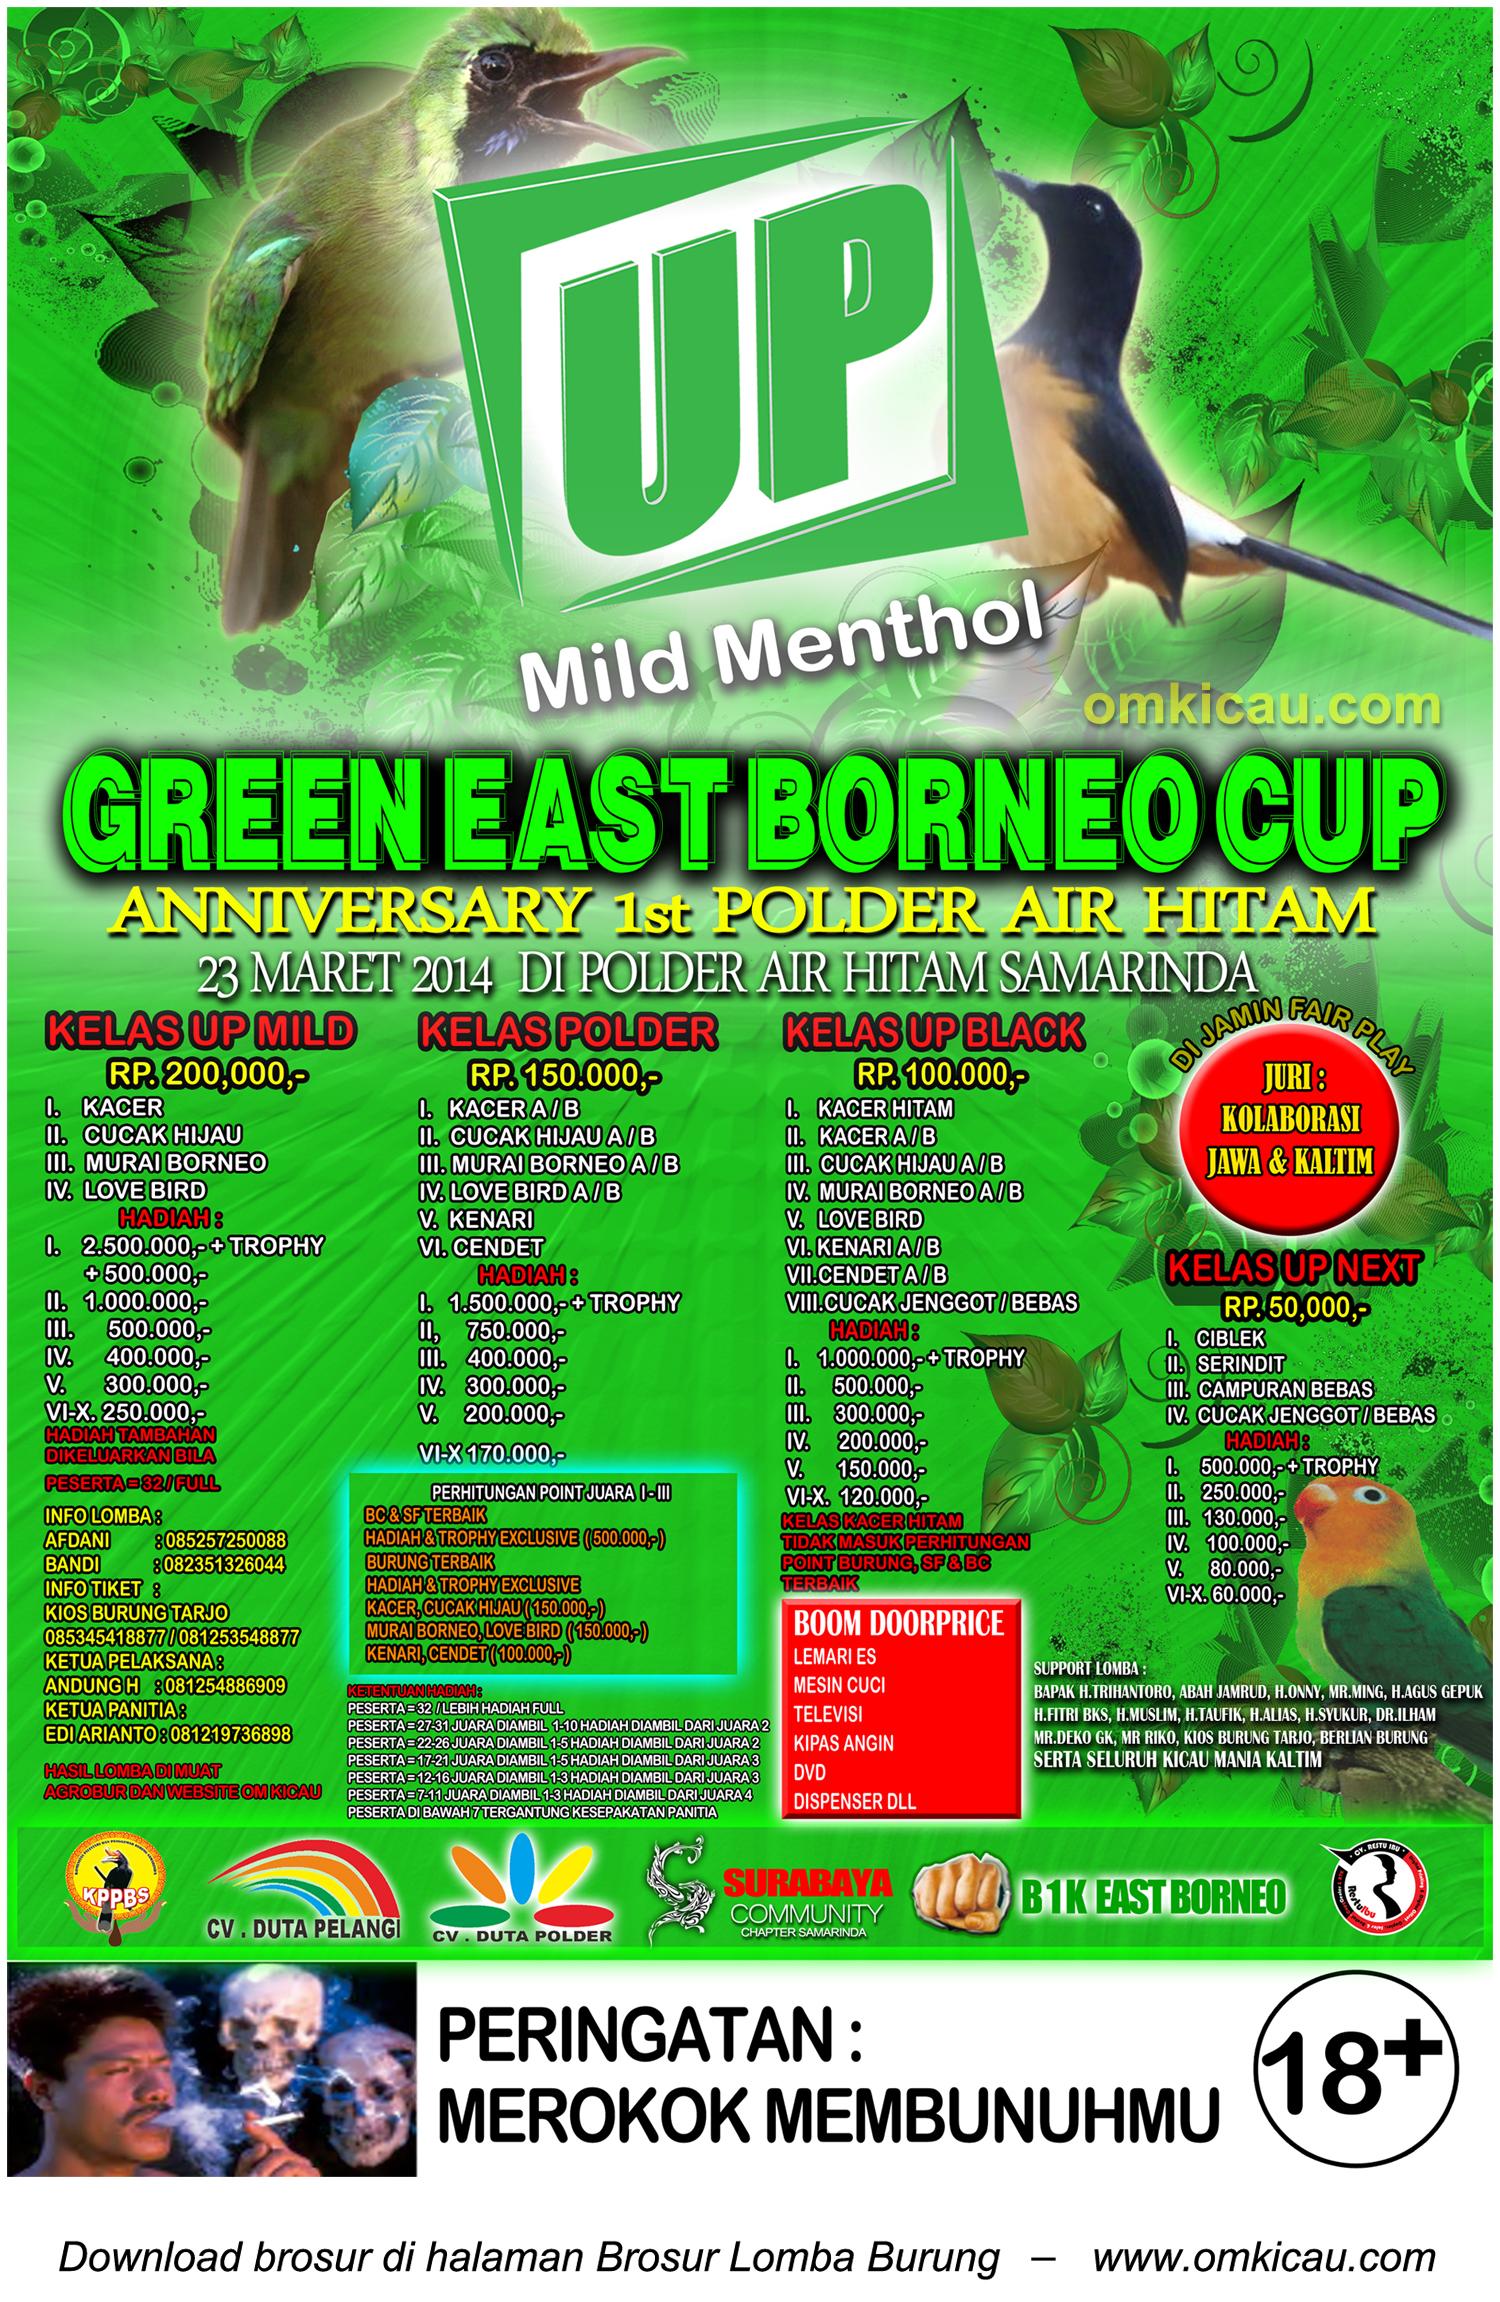 Brosur Lomba Burung Berkicau Green East Borneo Cup, Samarinda, 23 Maret 2014